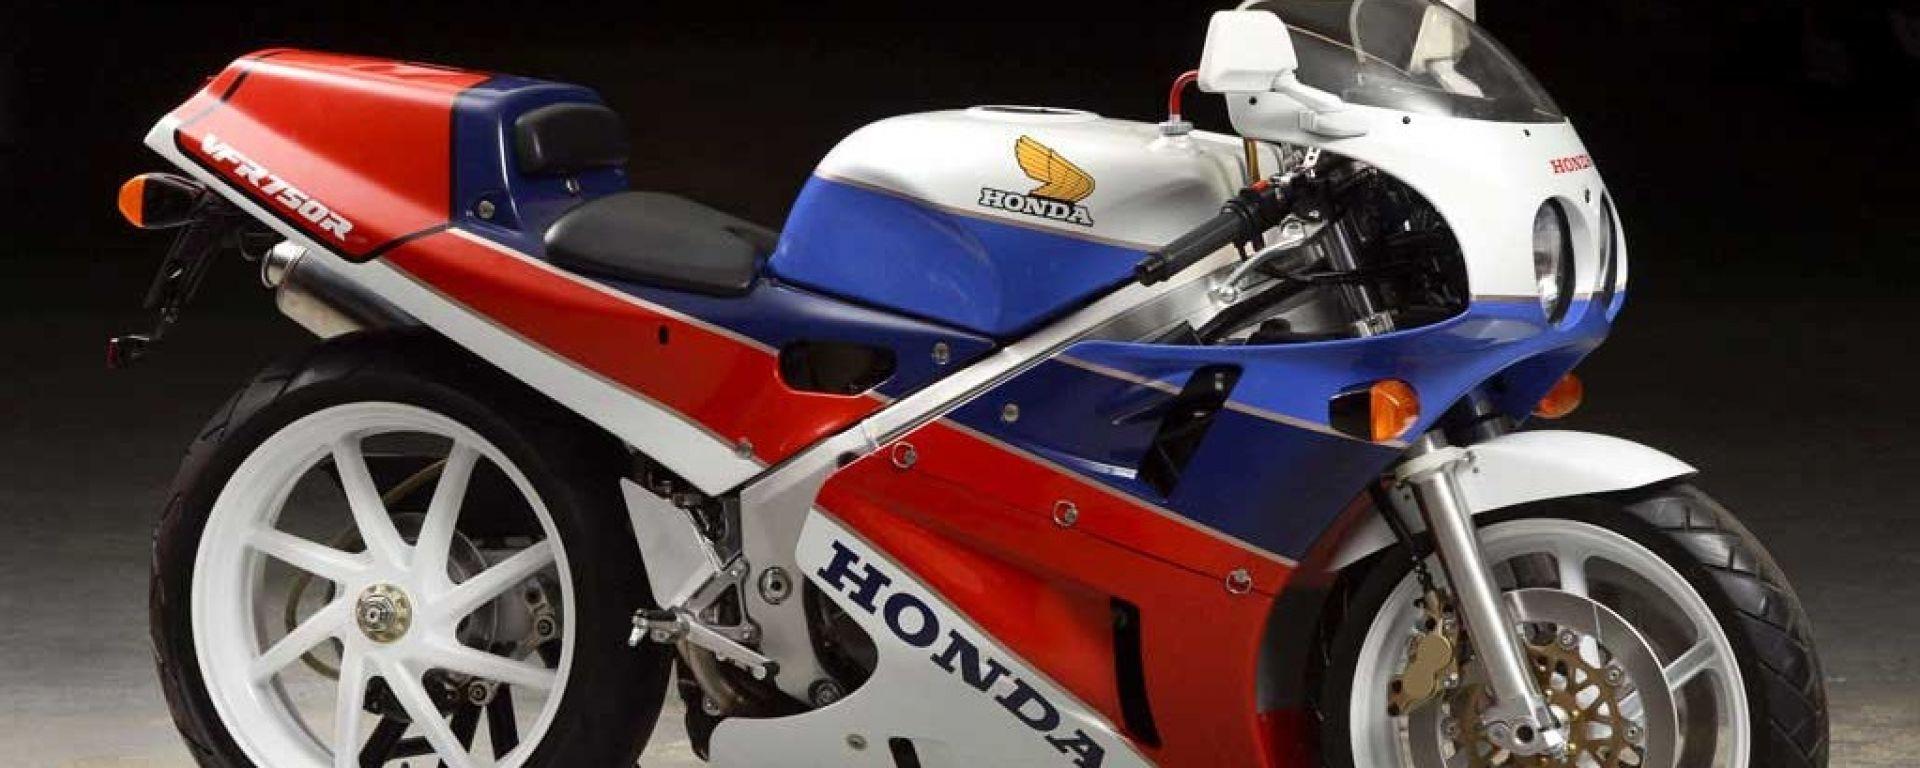 Honda VFR750R RC30, nata per vincere in Superbike